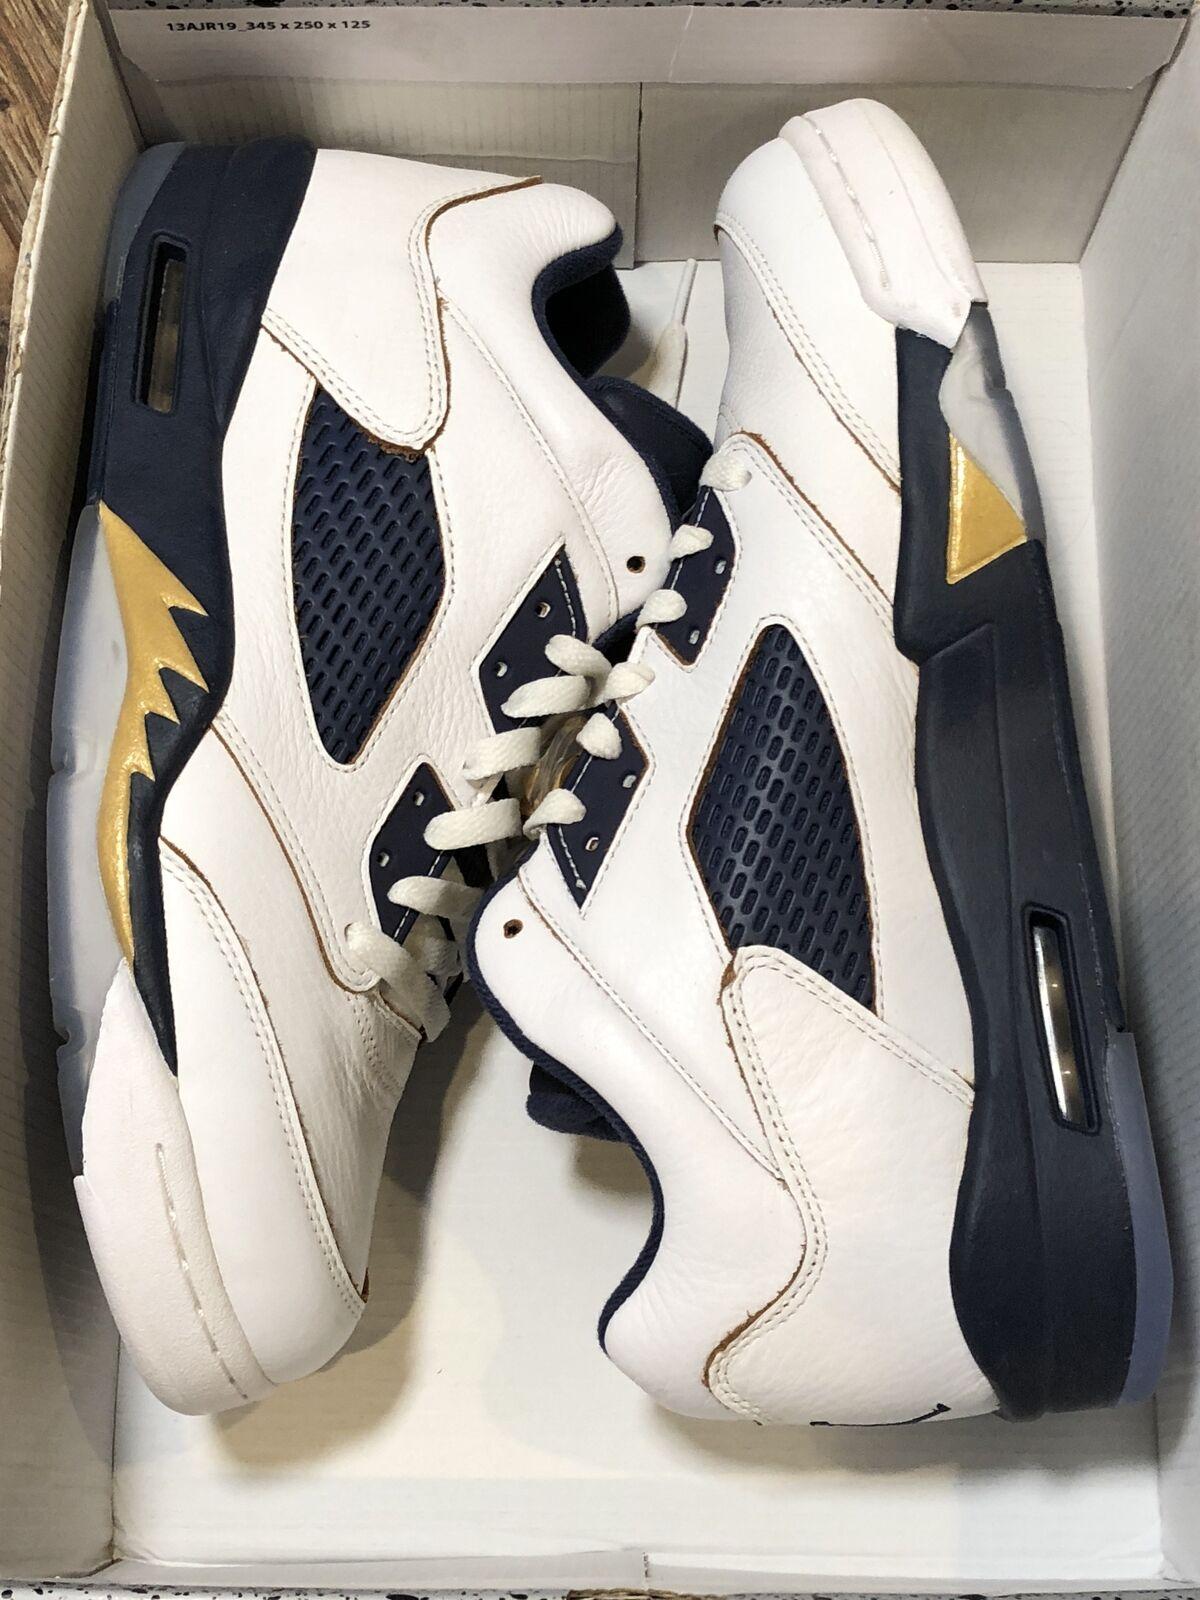 1ec255fdab70 Size 10 Men s Air Jordan Retro 5 Low Dunk From Above 819171 135 for ...